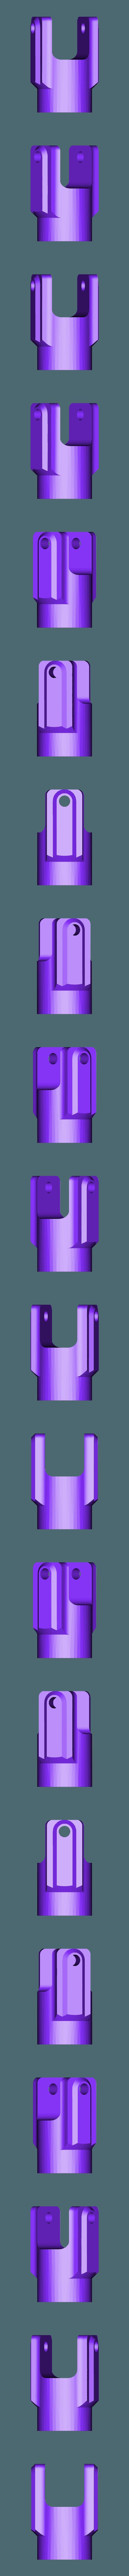 TruckV3_Axle_center_shaft_Ujoint_C.STL Download STL file 3D Printed RC Truck V3 • 3D print model, MrCrankyface